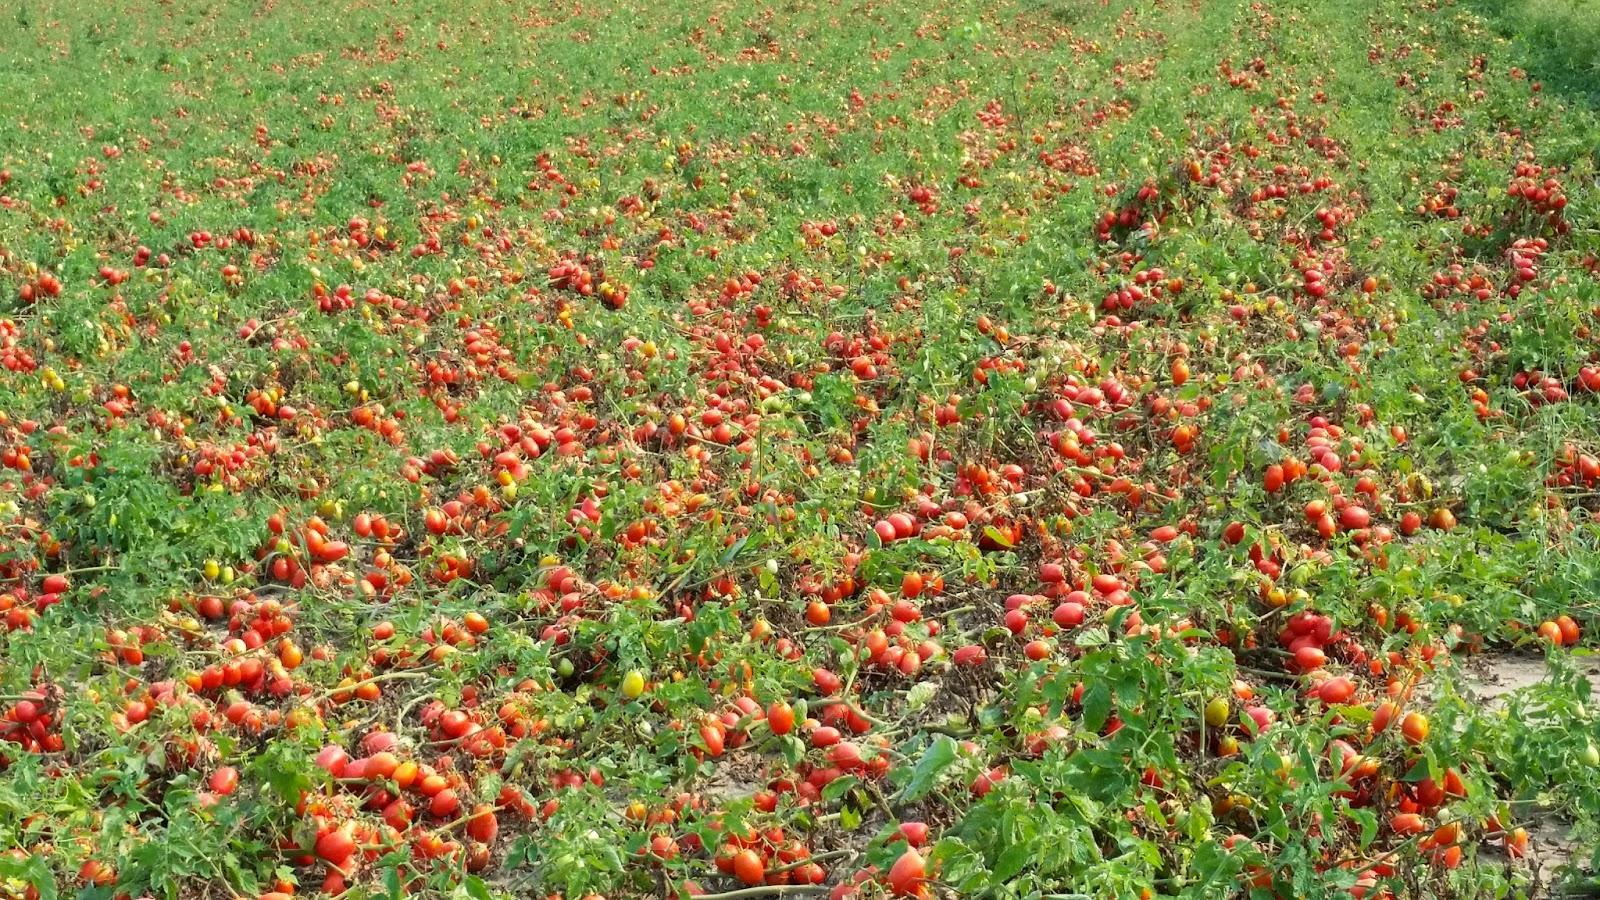 tomato field hd  images க்கான பட முடிவு